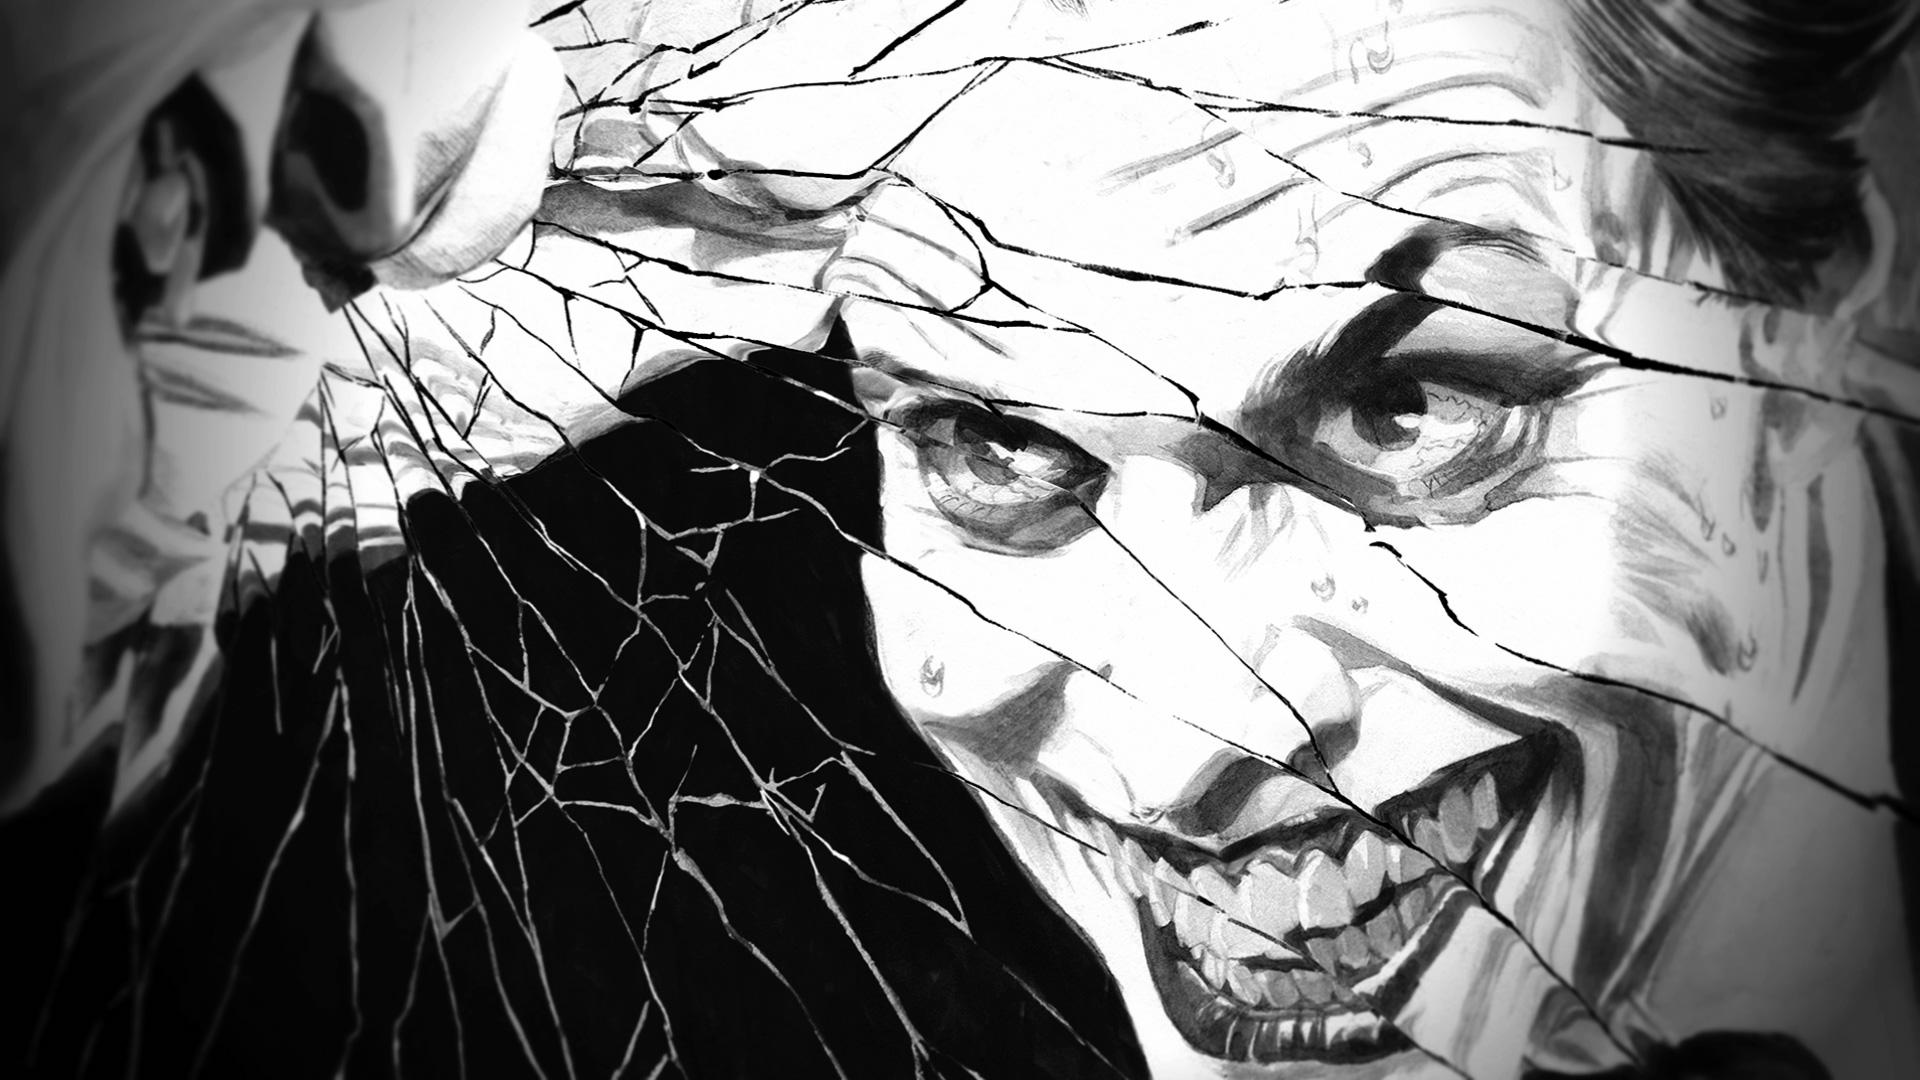 "<a href=""/batman-black-and-white"">Batman: Black and White</a>"